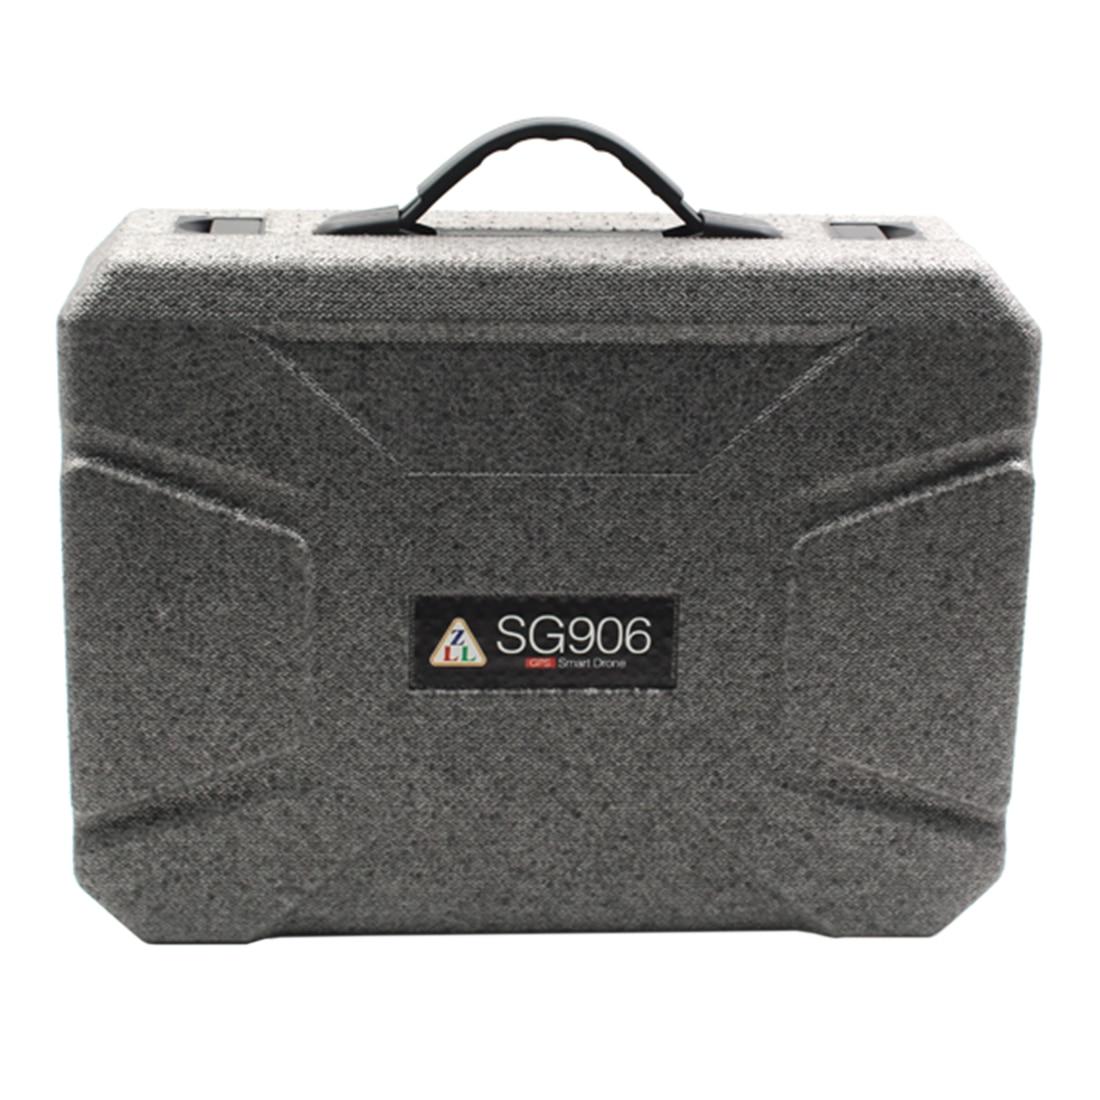 HOBBYINRC Quadcopter Carrying Case Protective Storage Box for SG906  SG906 Pro   F11   Z5   DJI Mavic Air Foldable Drone Bag